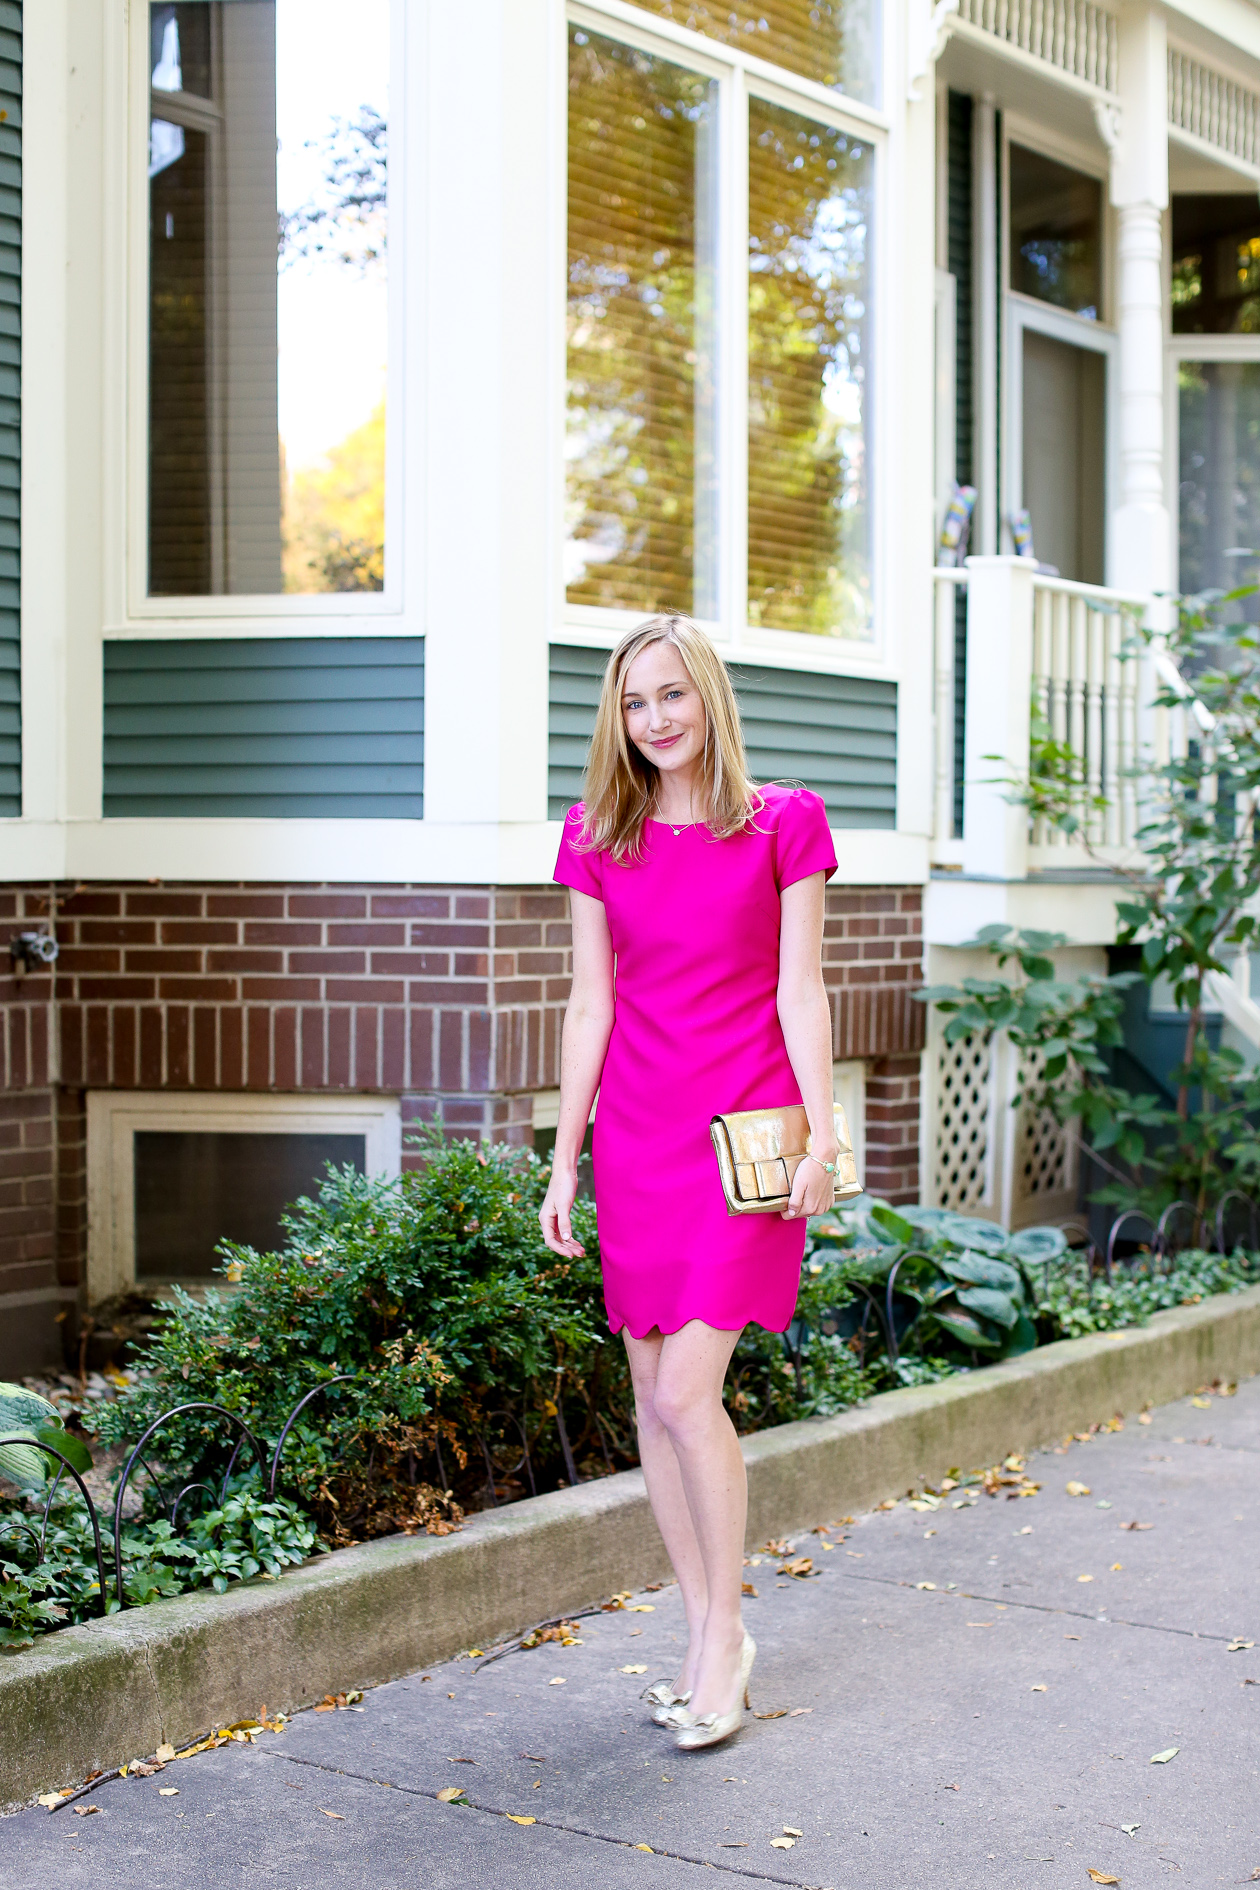 Camilyn-Beth-Scalloped-Bridgette-Dress-100